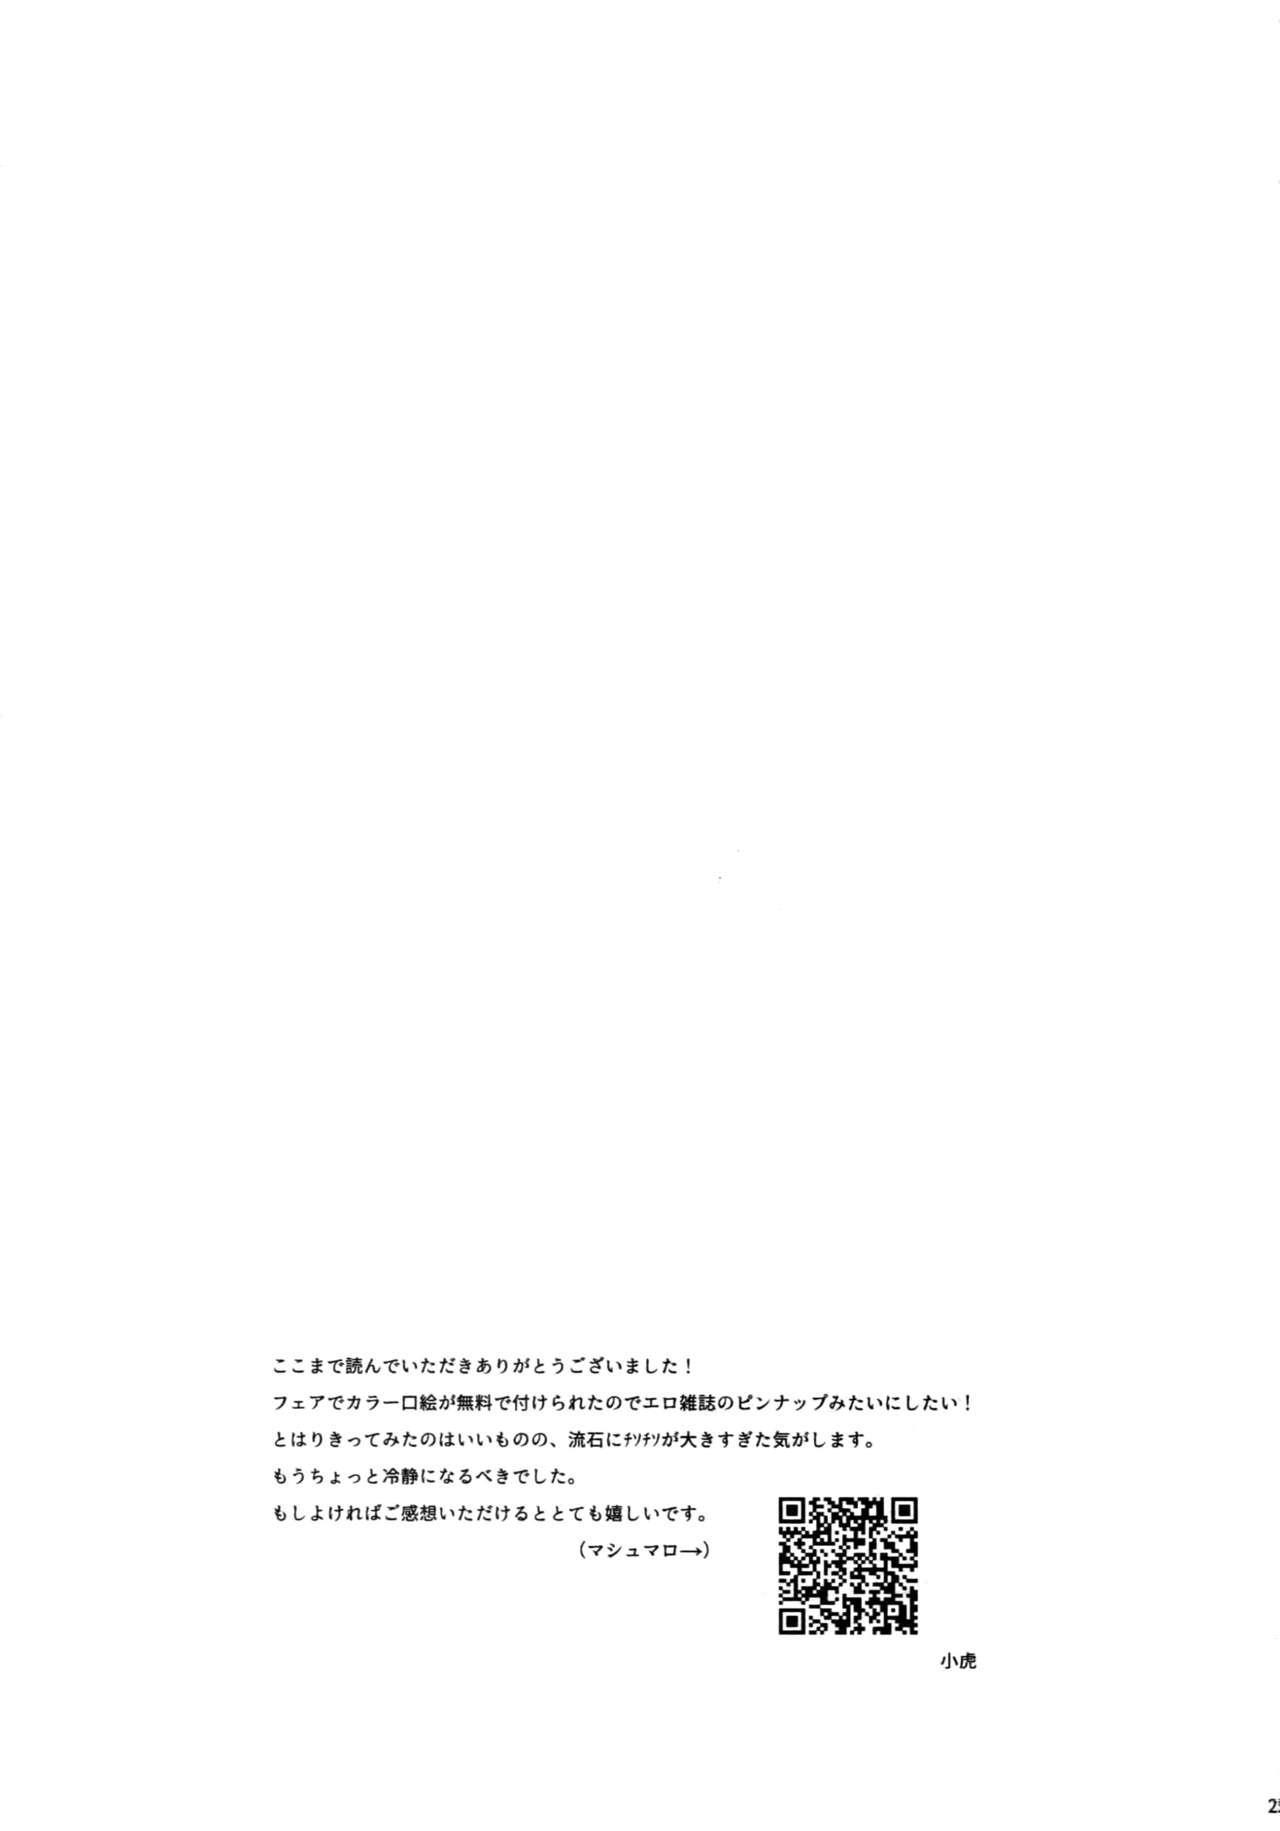 (Super ROOT 4 to 5 2019) [xxkorori (Ko Tora)] Kando 500-bai Yami no Kyoukaku Nonstop Namahame 24-ji | 500-times Enhanced 24-hour Nonstop Raw Sex Session with the Guest of Darkness (Fate/Grand Order) [English] [MintVoid] 24